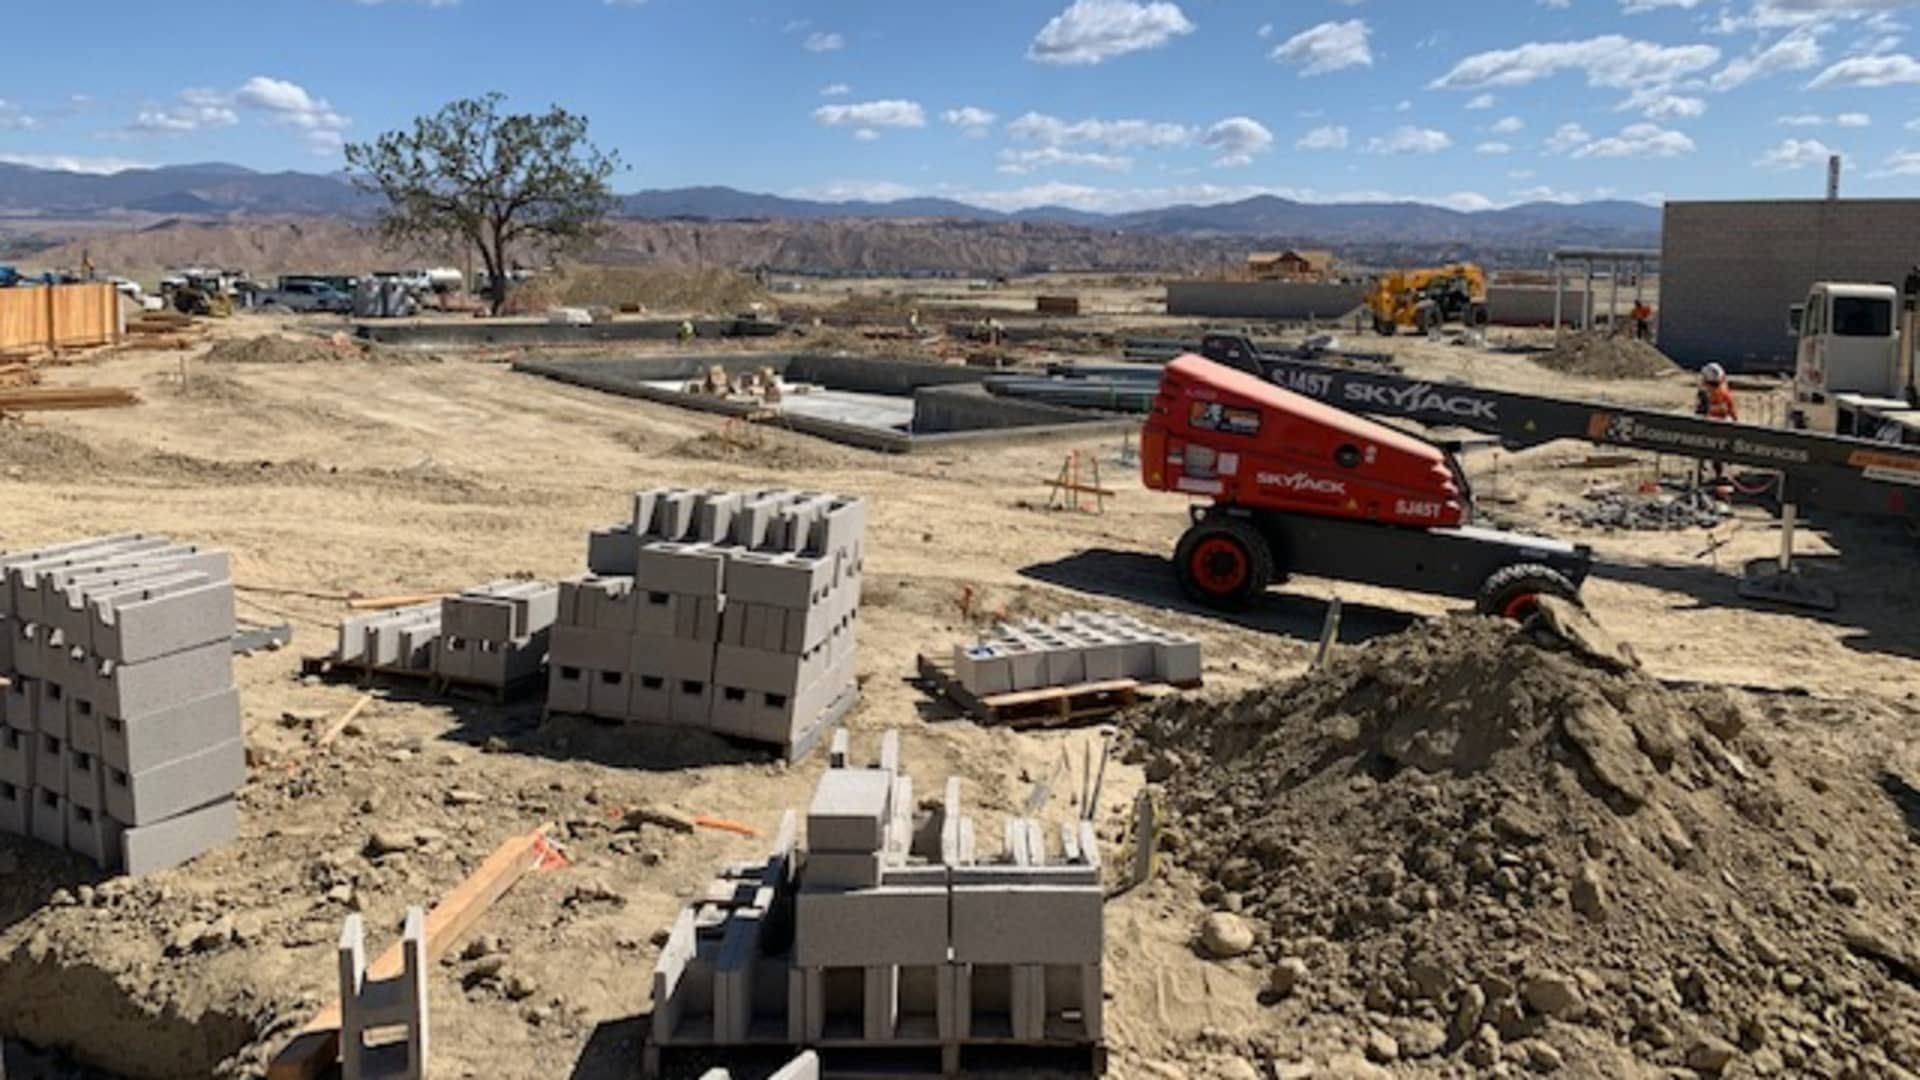 A net zero community development under construction in Valencia.